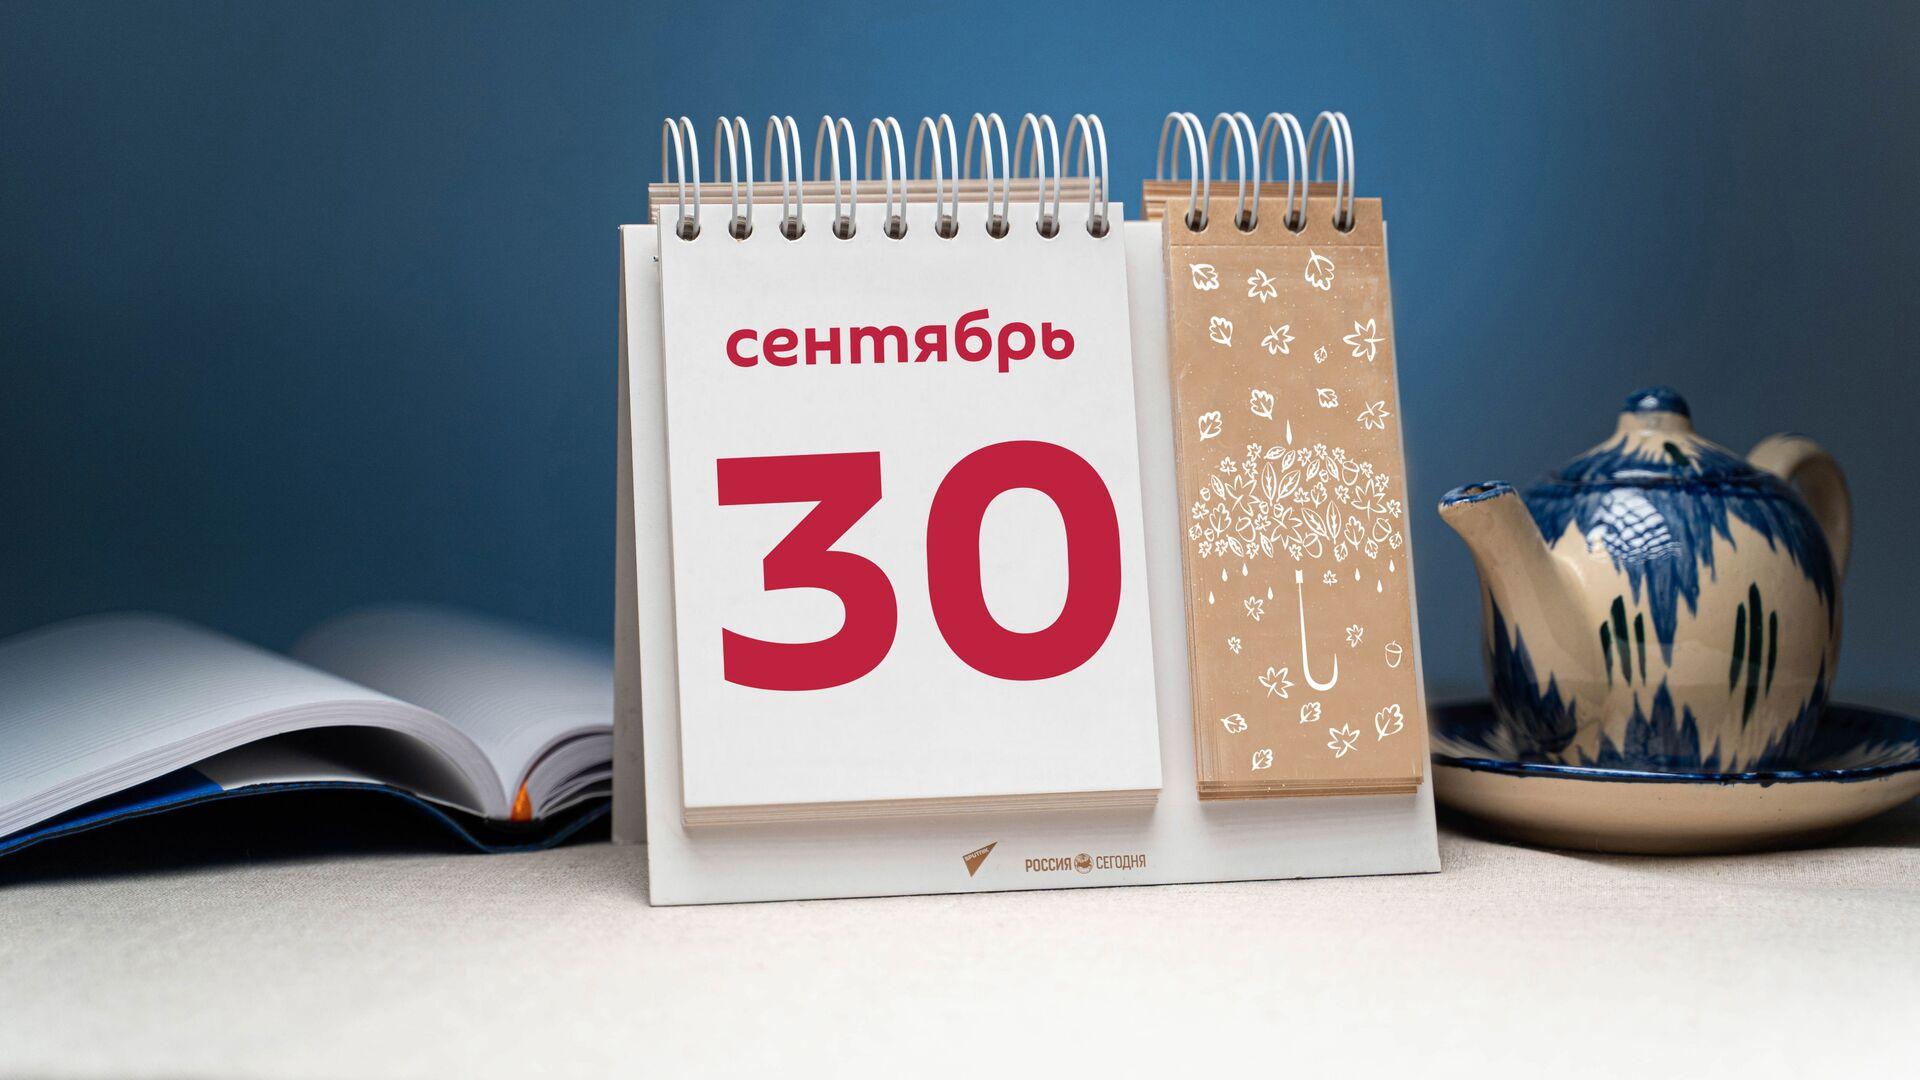 День 30 сентября - Sputnik Тоҷикистон, 1920, 30.09.2021